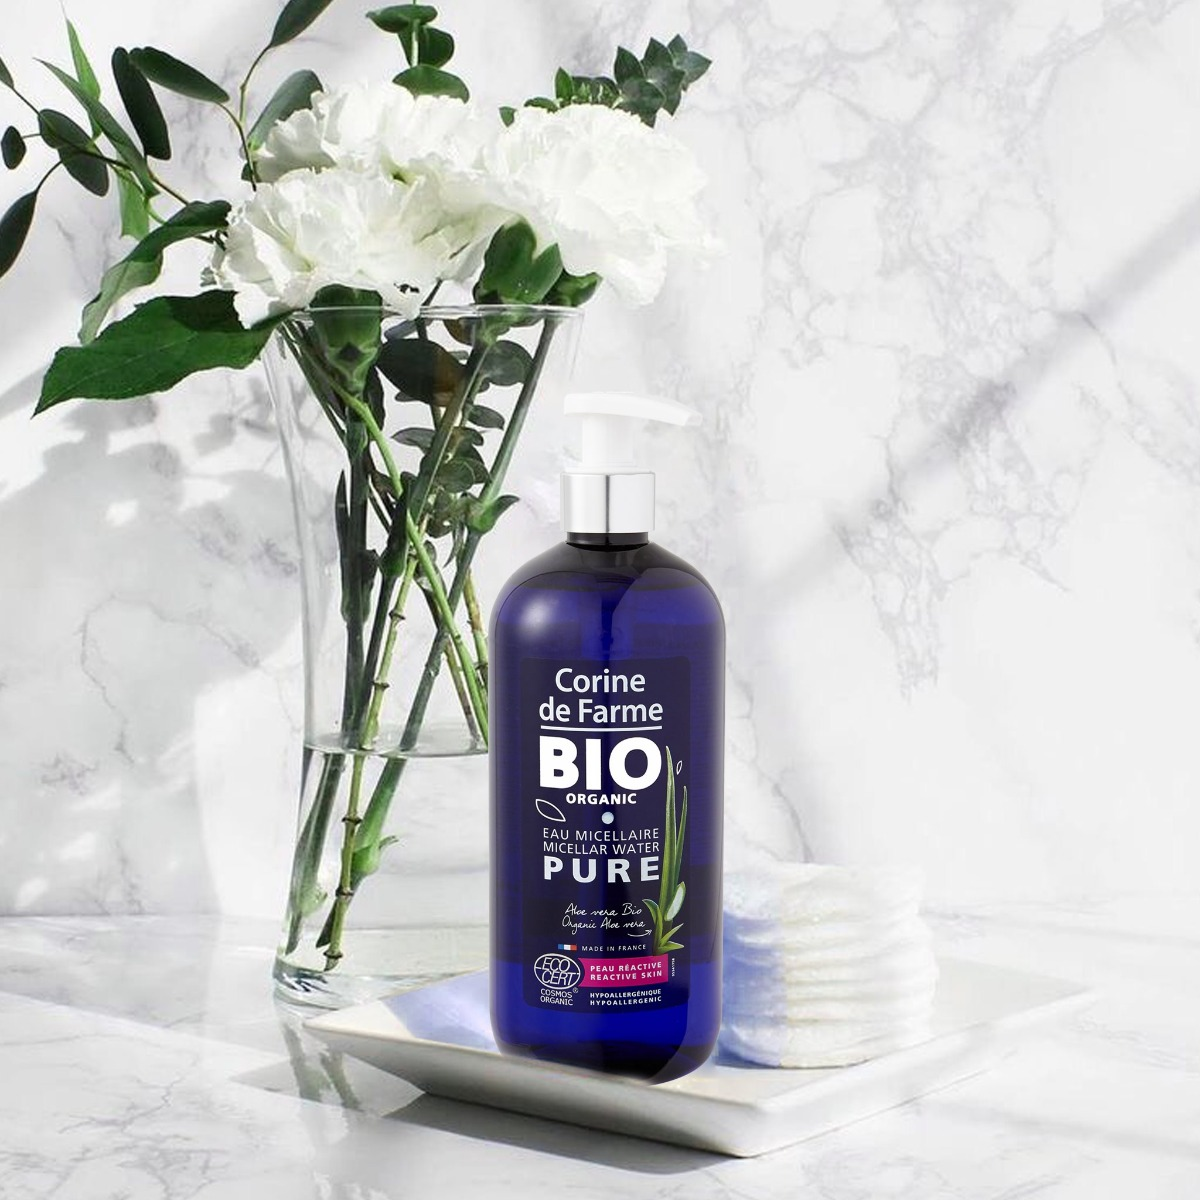 Nước Tẩy Trang Hữu Cơ Cho Da Nhạy Cảm CORINE DE FARME Bio Organic Micellar Water Pure 500ml